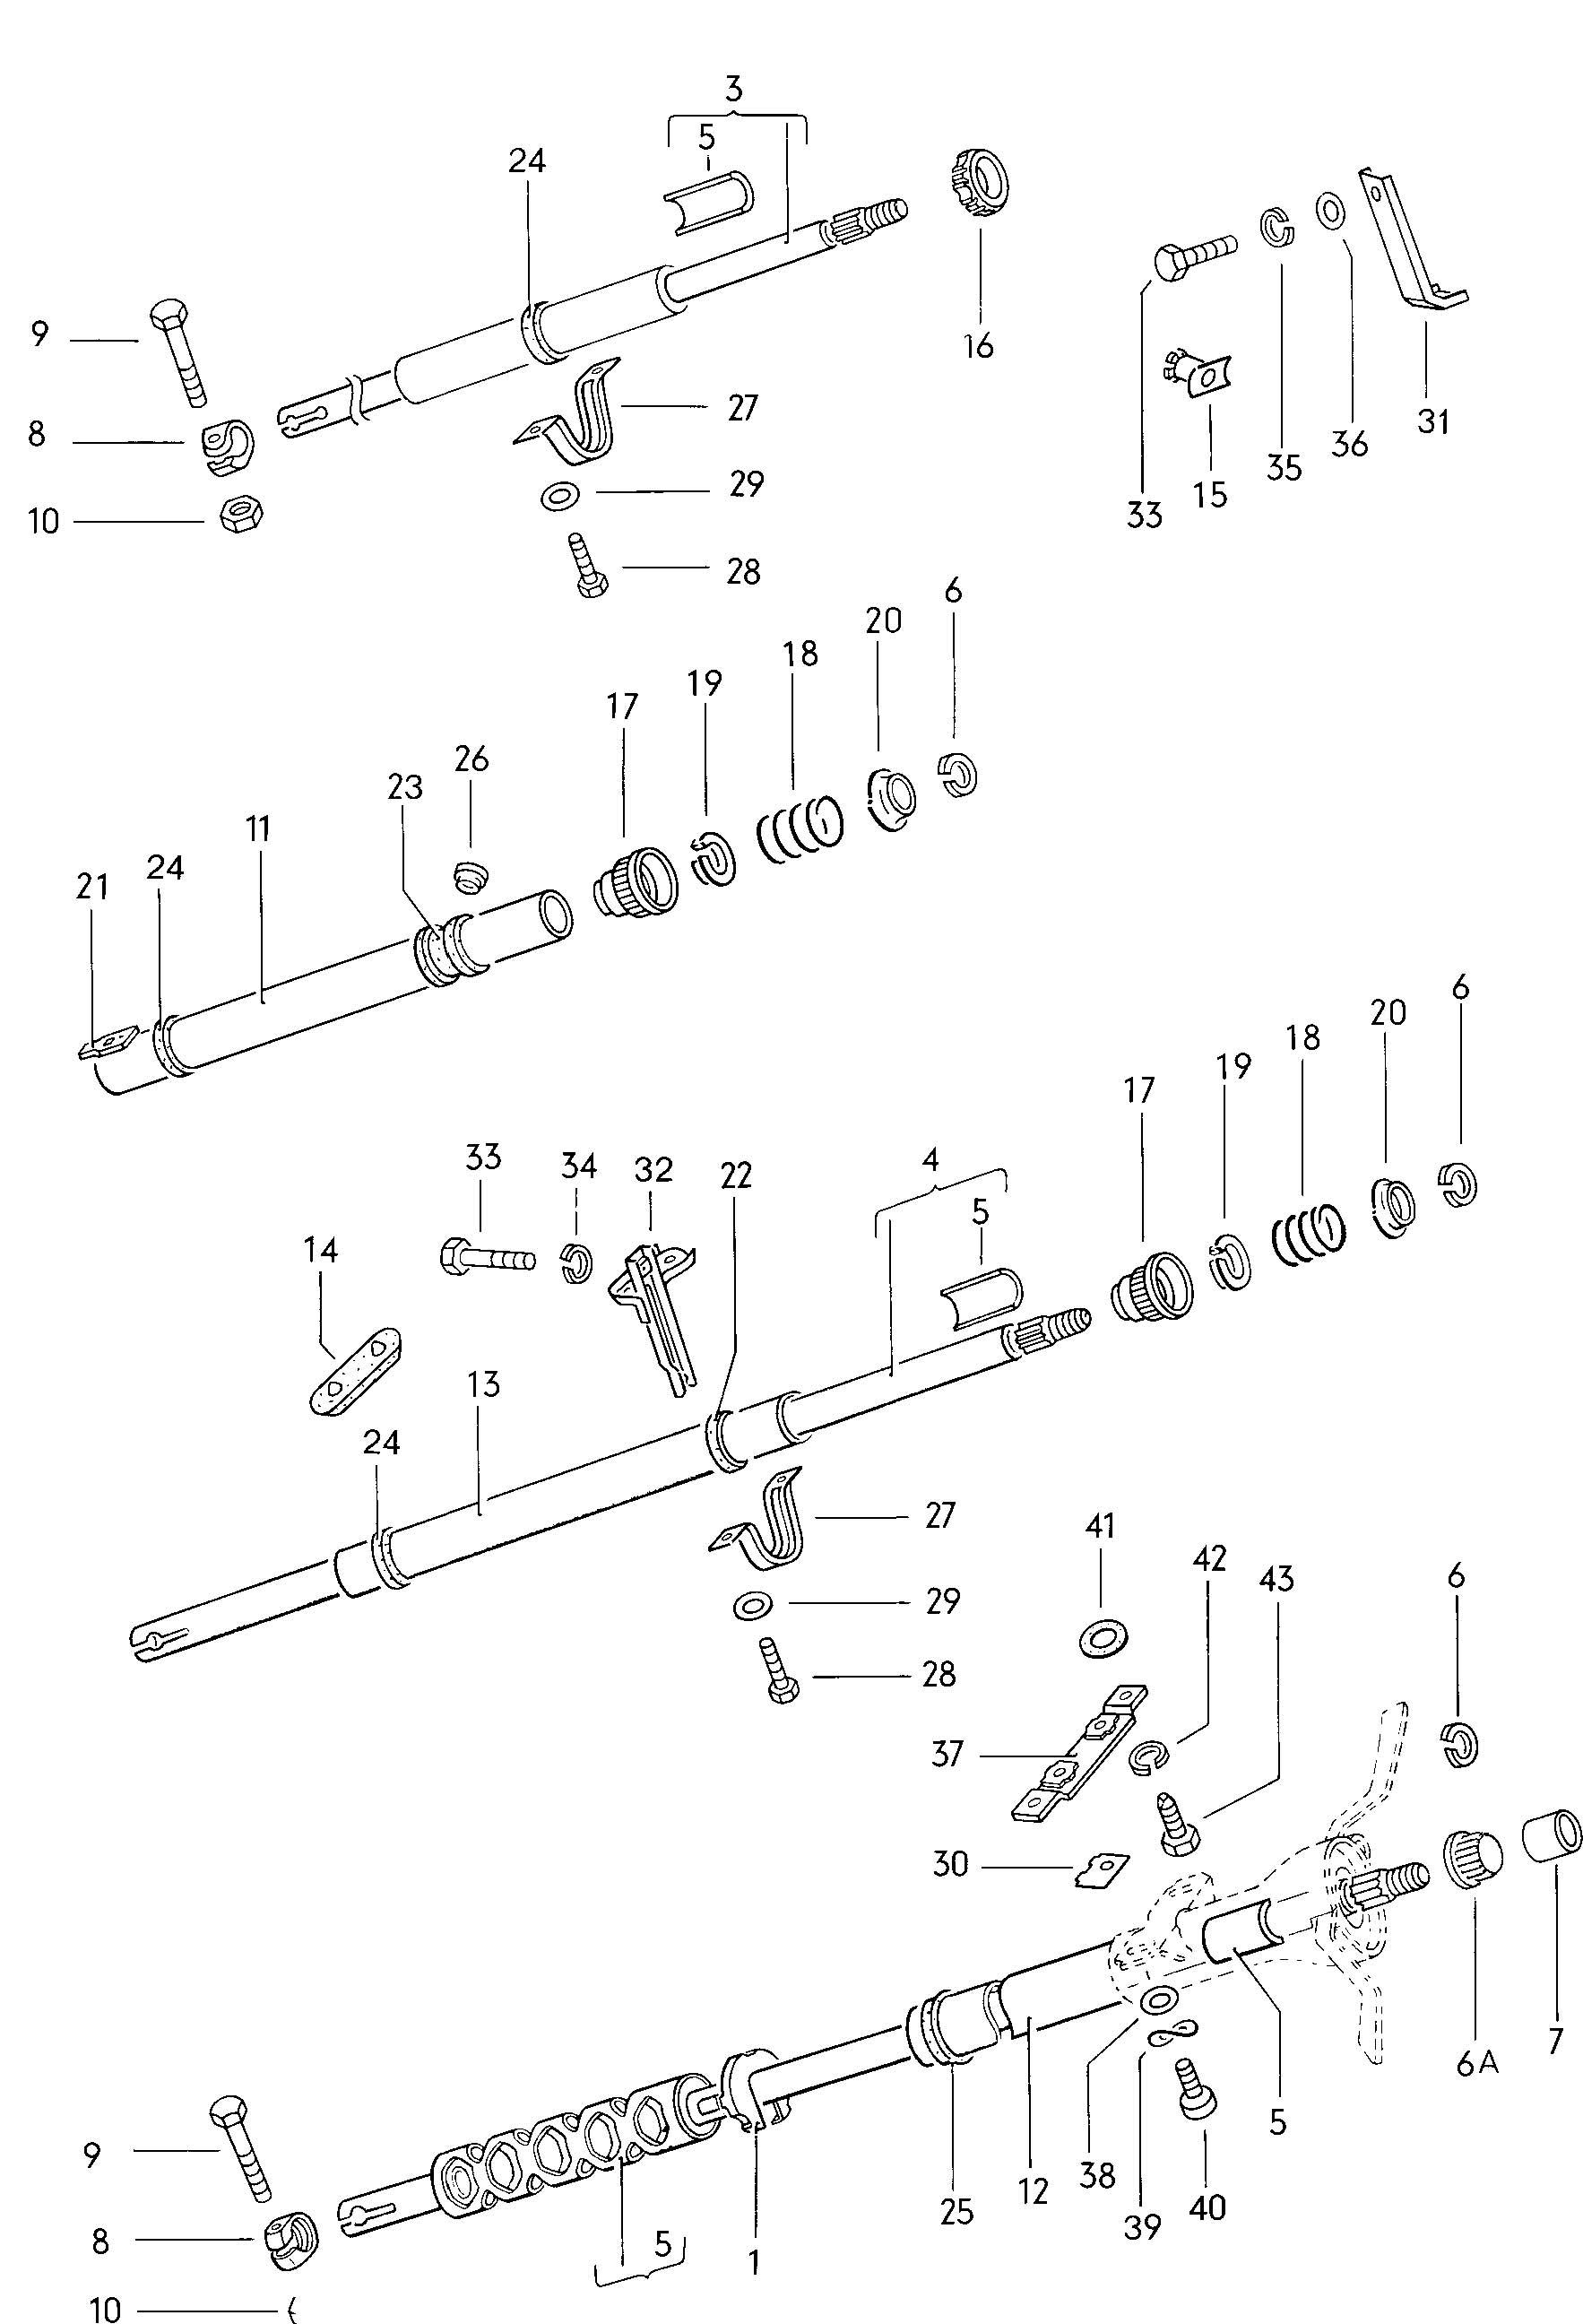 Beetle 1958 1967 View Topic Steering Shaft And 1970vwbeetleenginediagram 1970 Vw Engine Diagram Http Jimellisvwpartscom Images Parts Fullsize 031048000